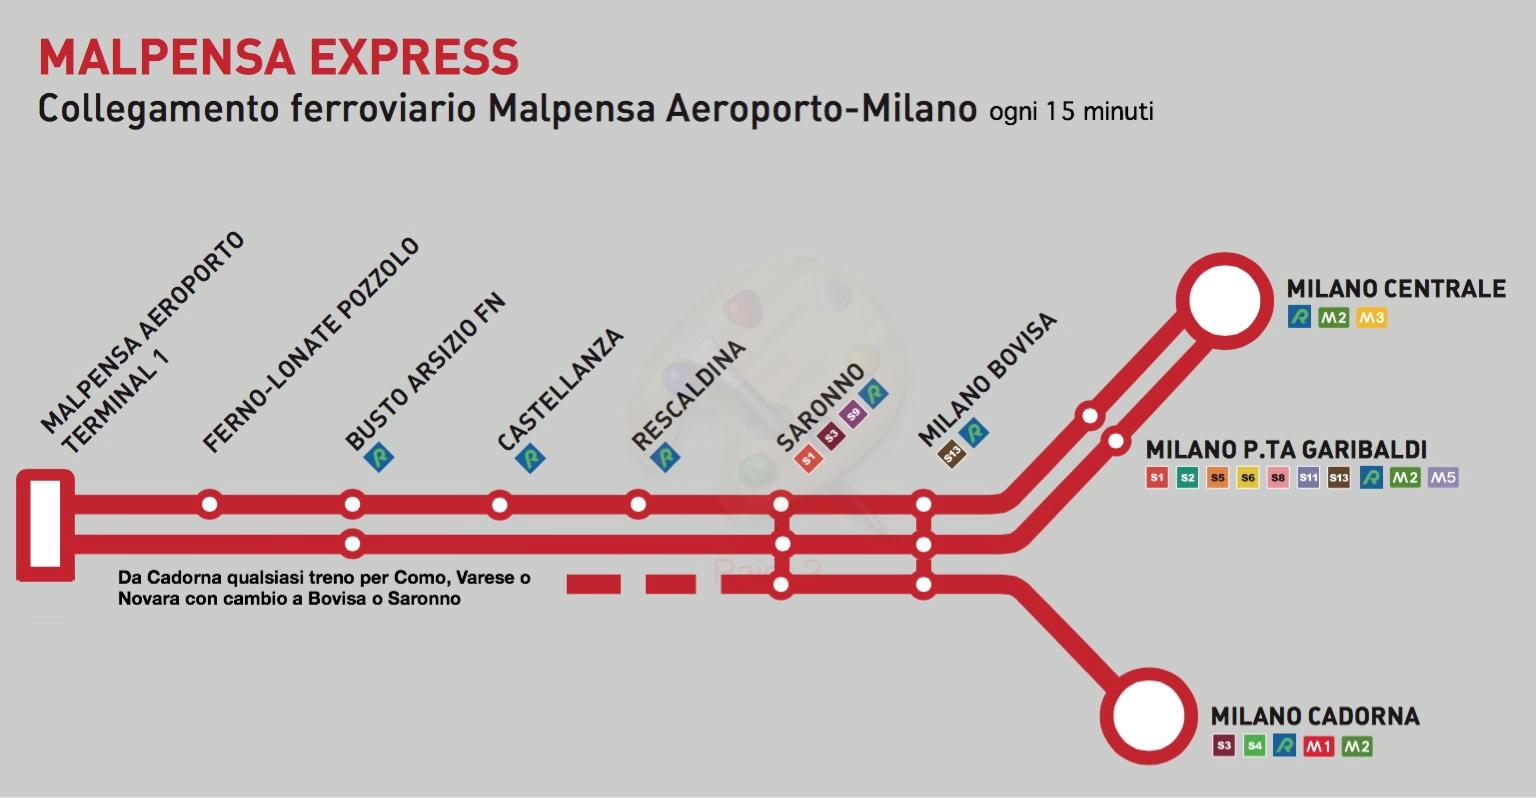 Nuovi prezzi malpensa express aeroportilombardi forum - Porta garibaldi malpensa terminal 2 ...